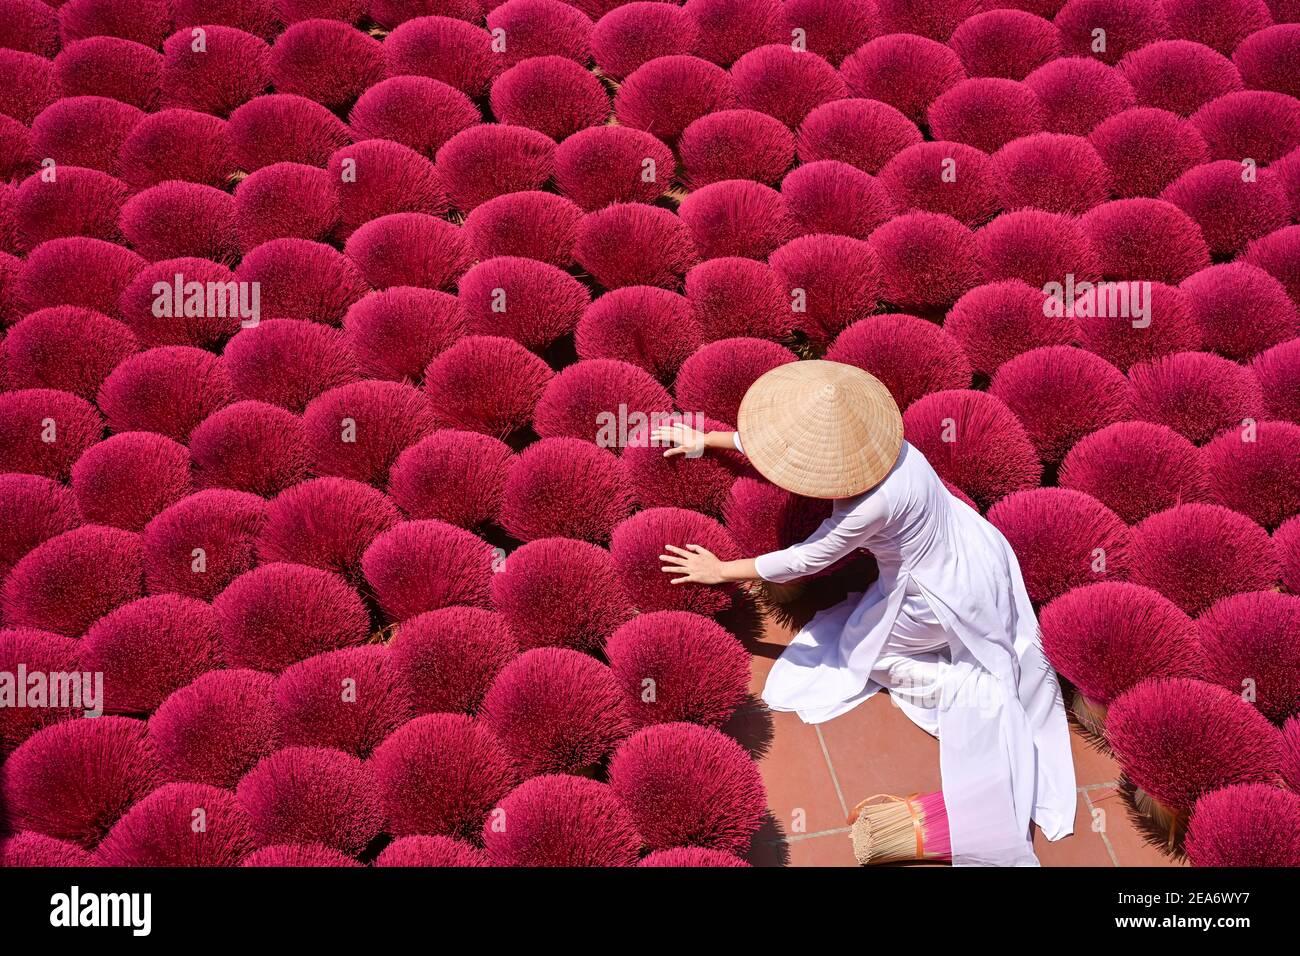 Woman gathering dried Incense sticks, Hanoi, Vietnam Stock Photo